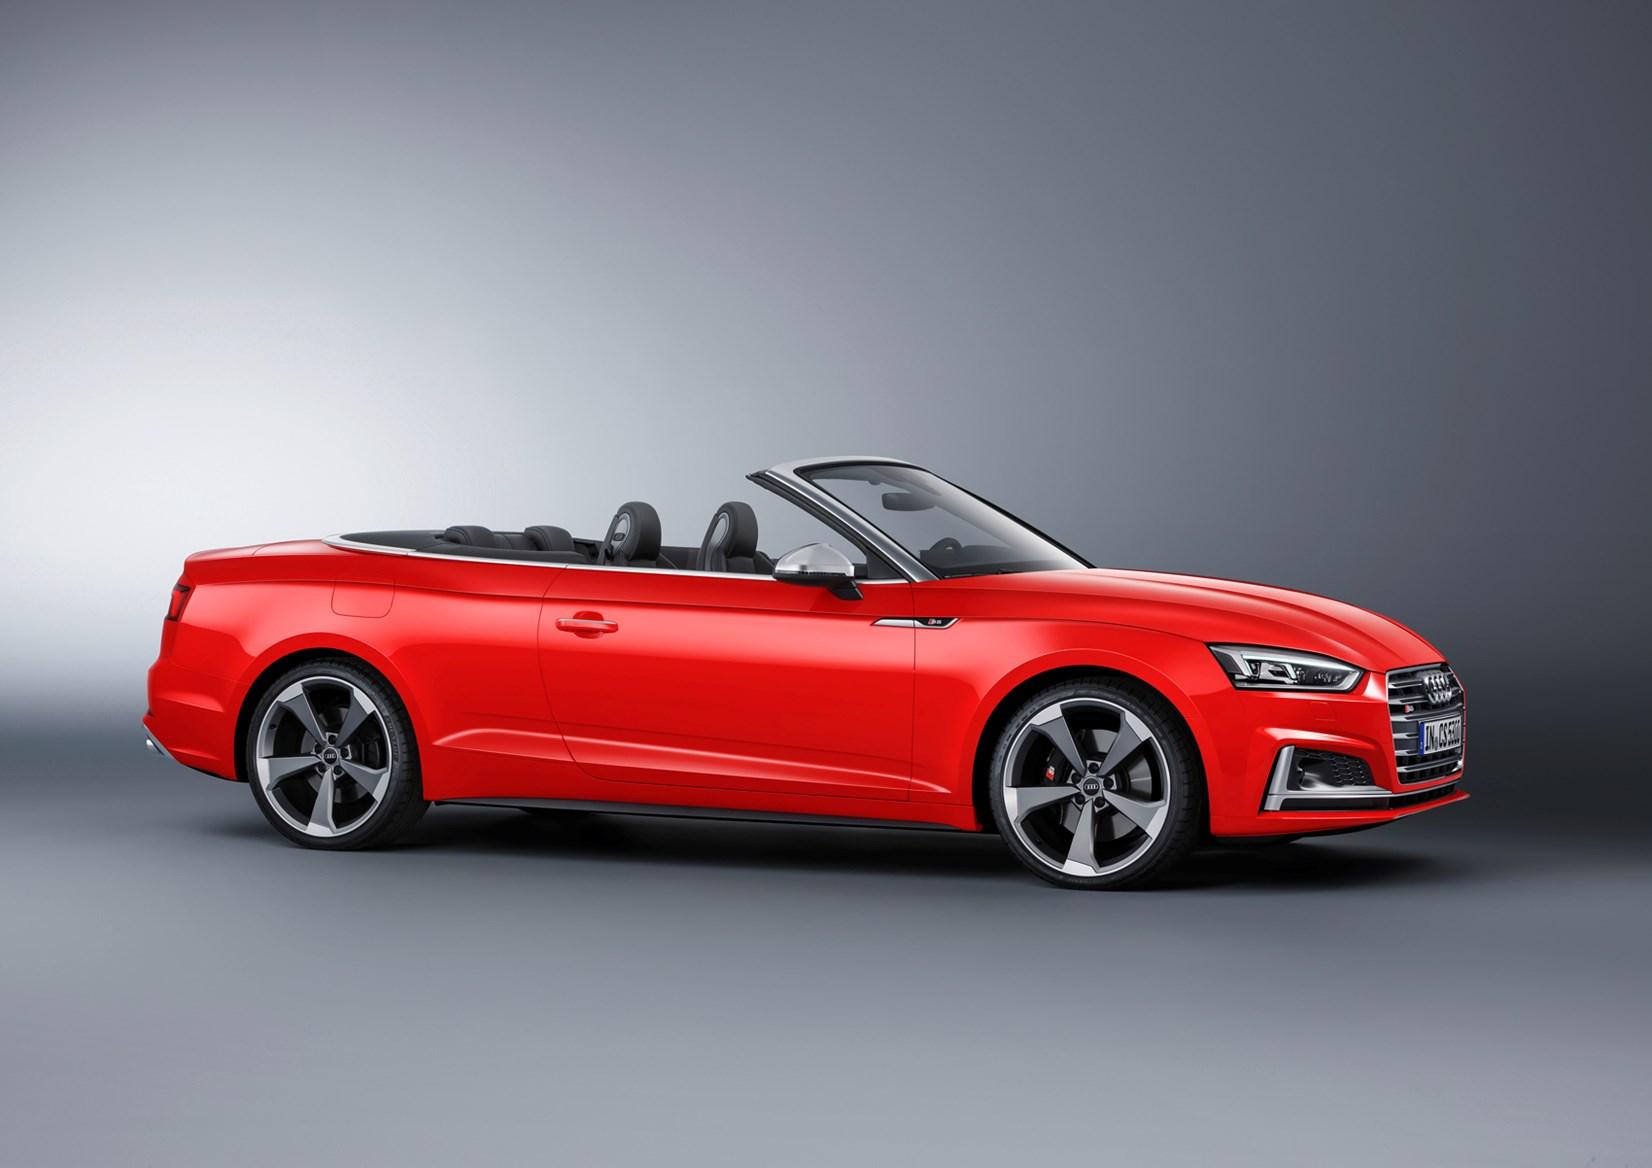 Audi s5 convertible lease deals Zinio coupon uk